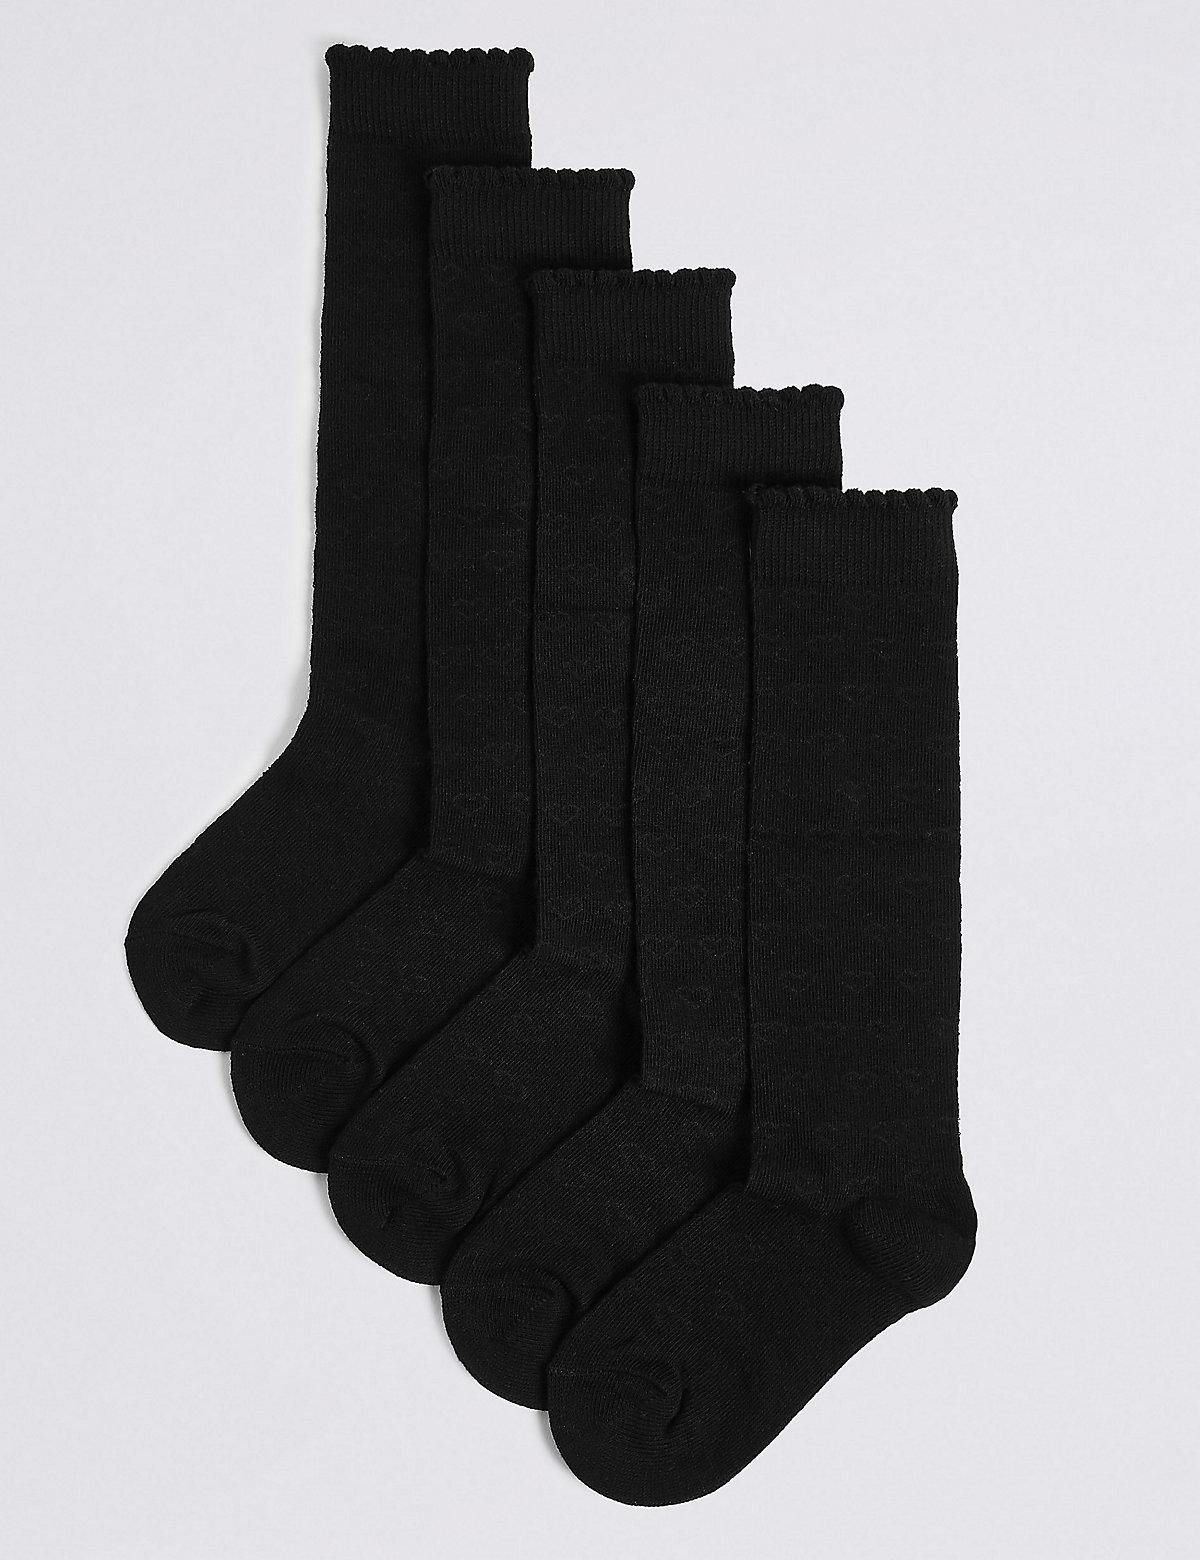 5 Pairs of Heart Print Knee High Socks (311 Years)